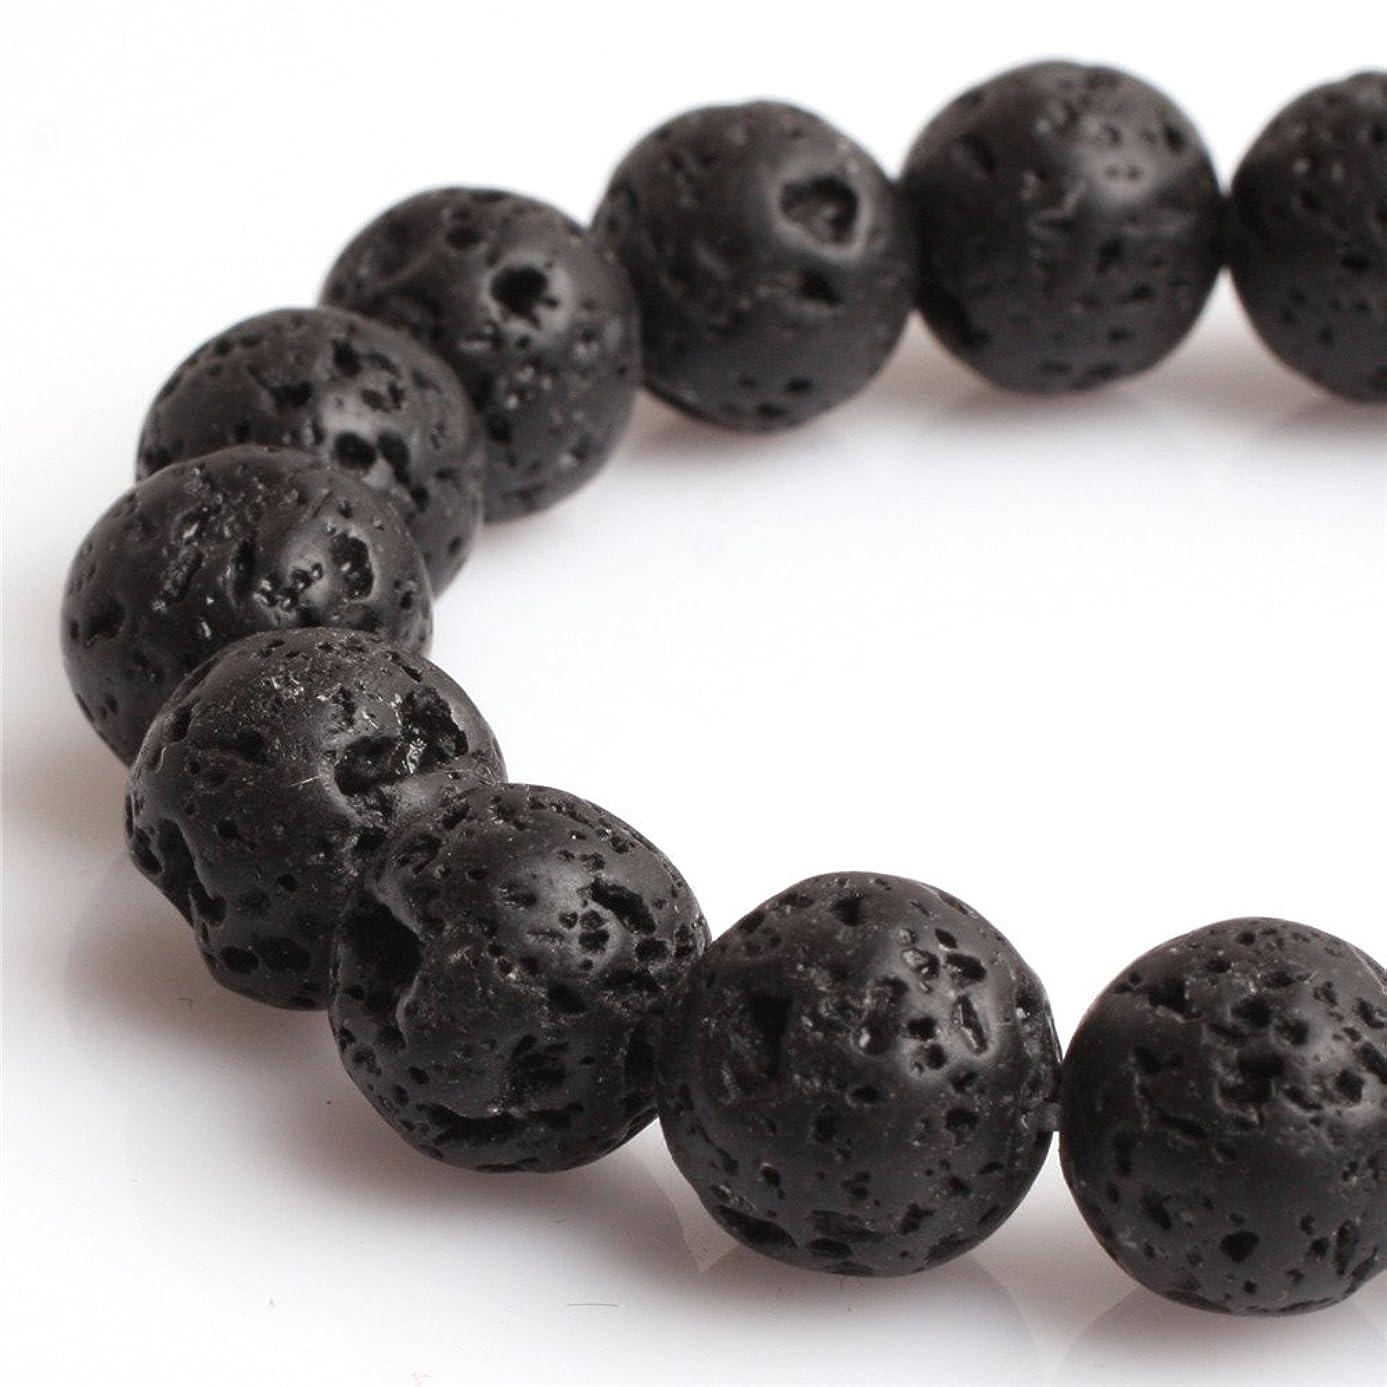 20mm Black Lava Rock Beads for Jewelry Making Natural Gemstone Semi Precious Round 15